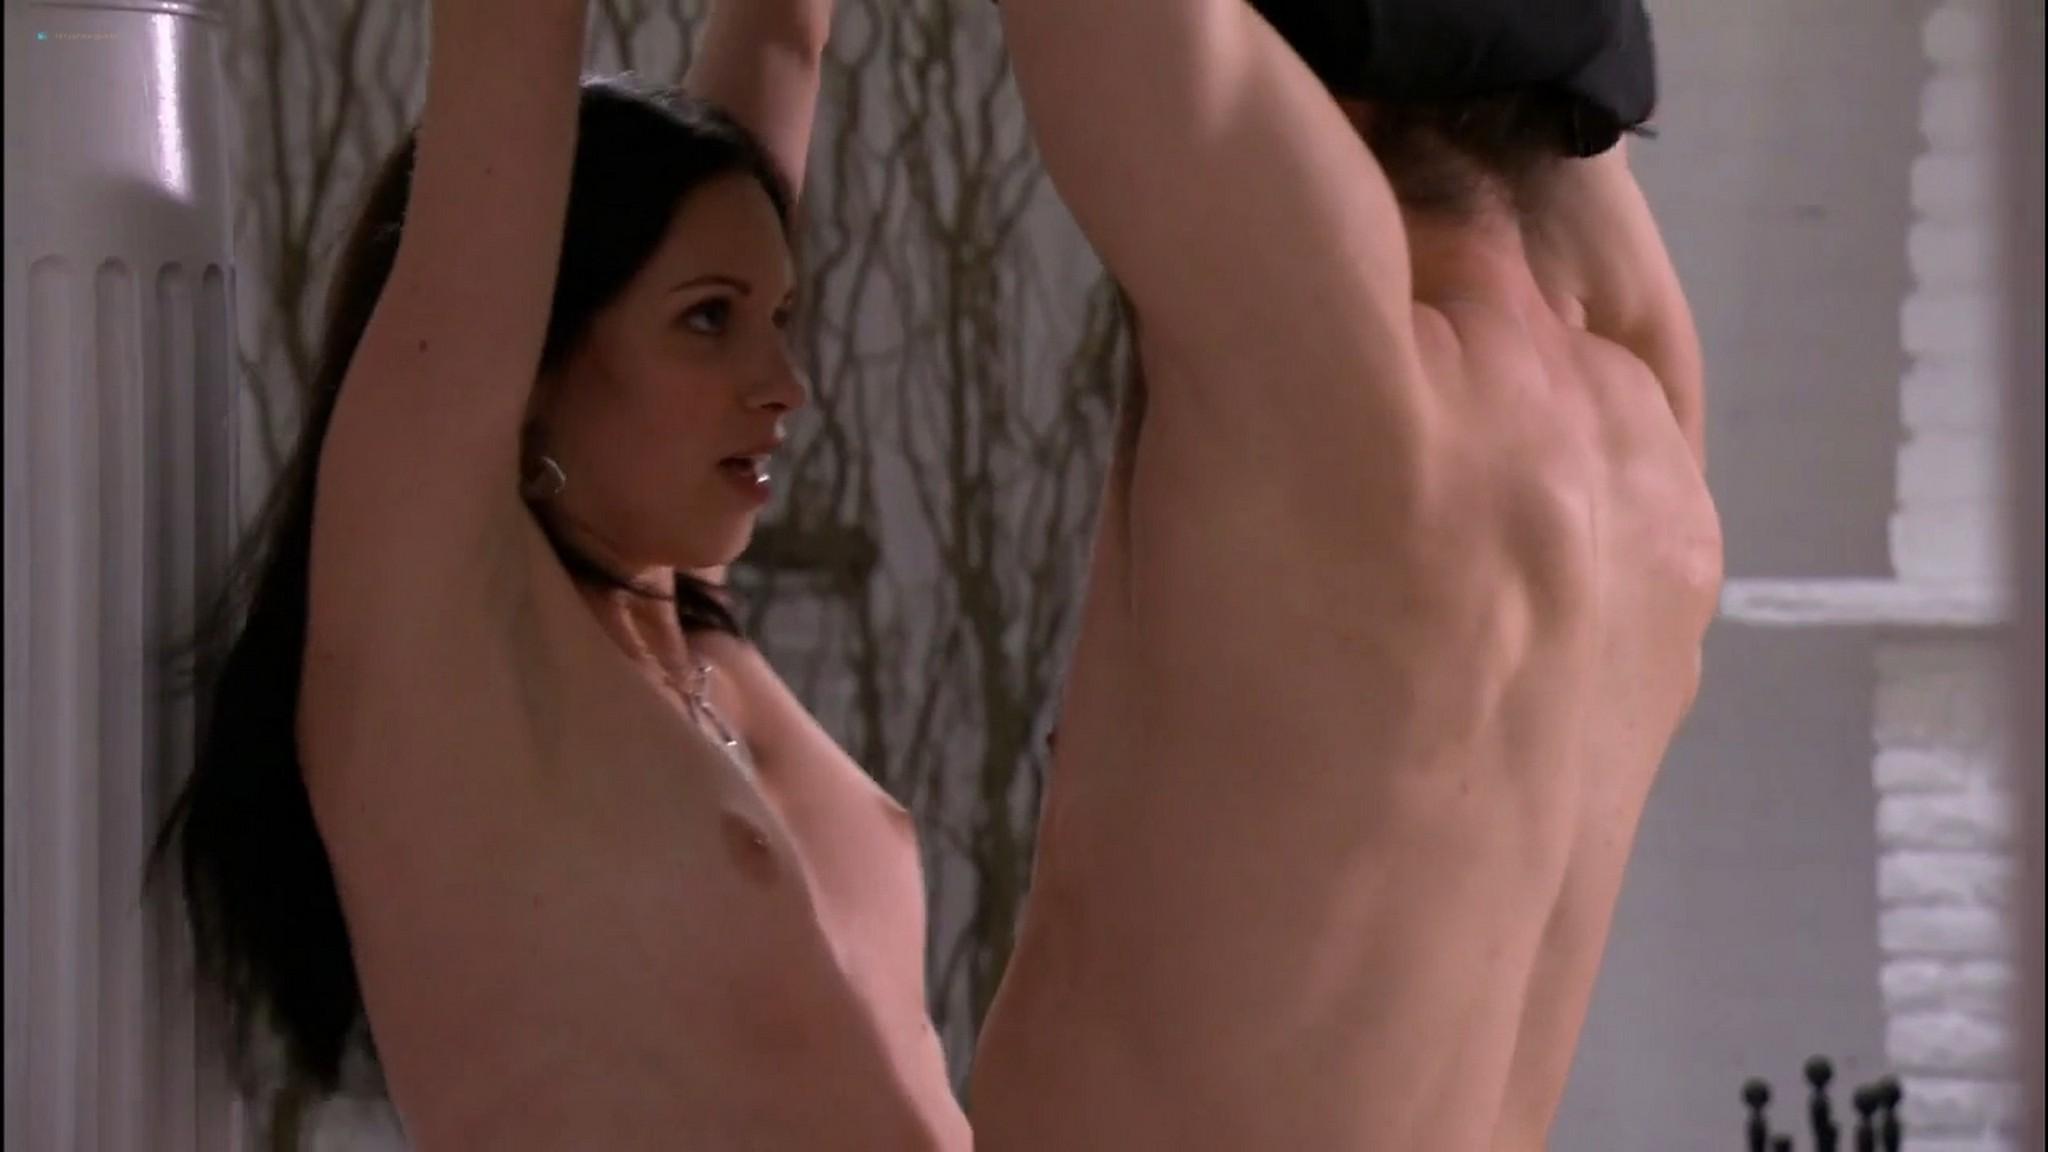 Erin Brown nude sex Jennifer Korbin, Denise Cobar and Lana Tailor nude - Lingerie (2009) HD 720p